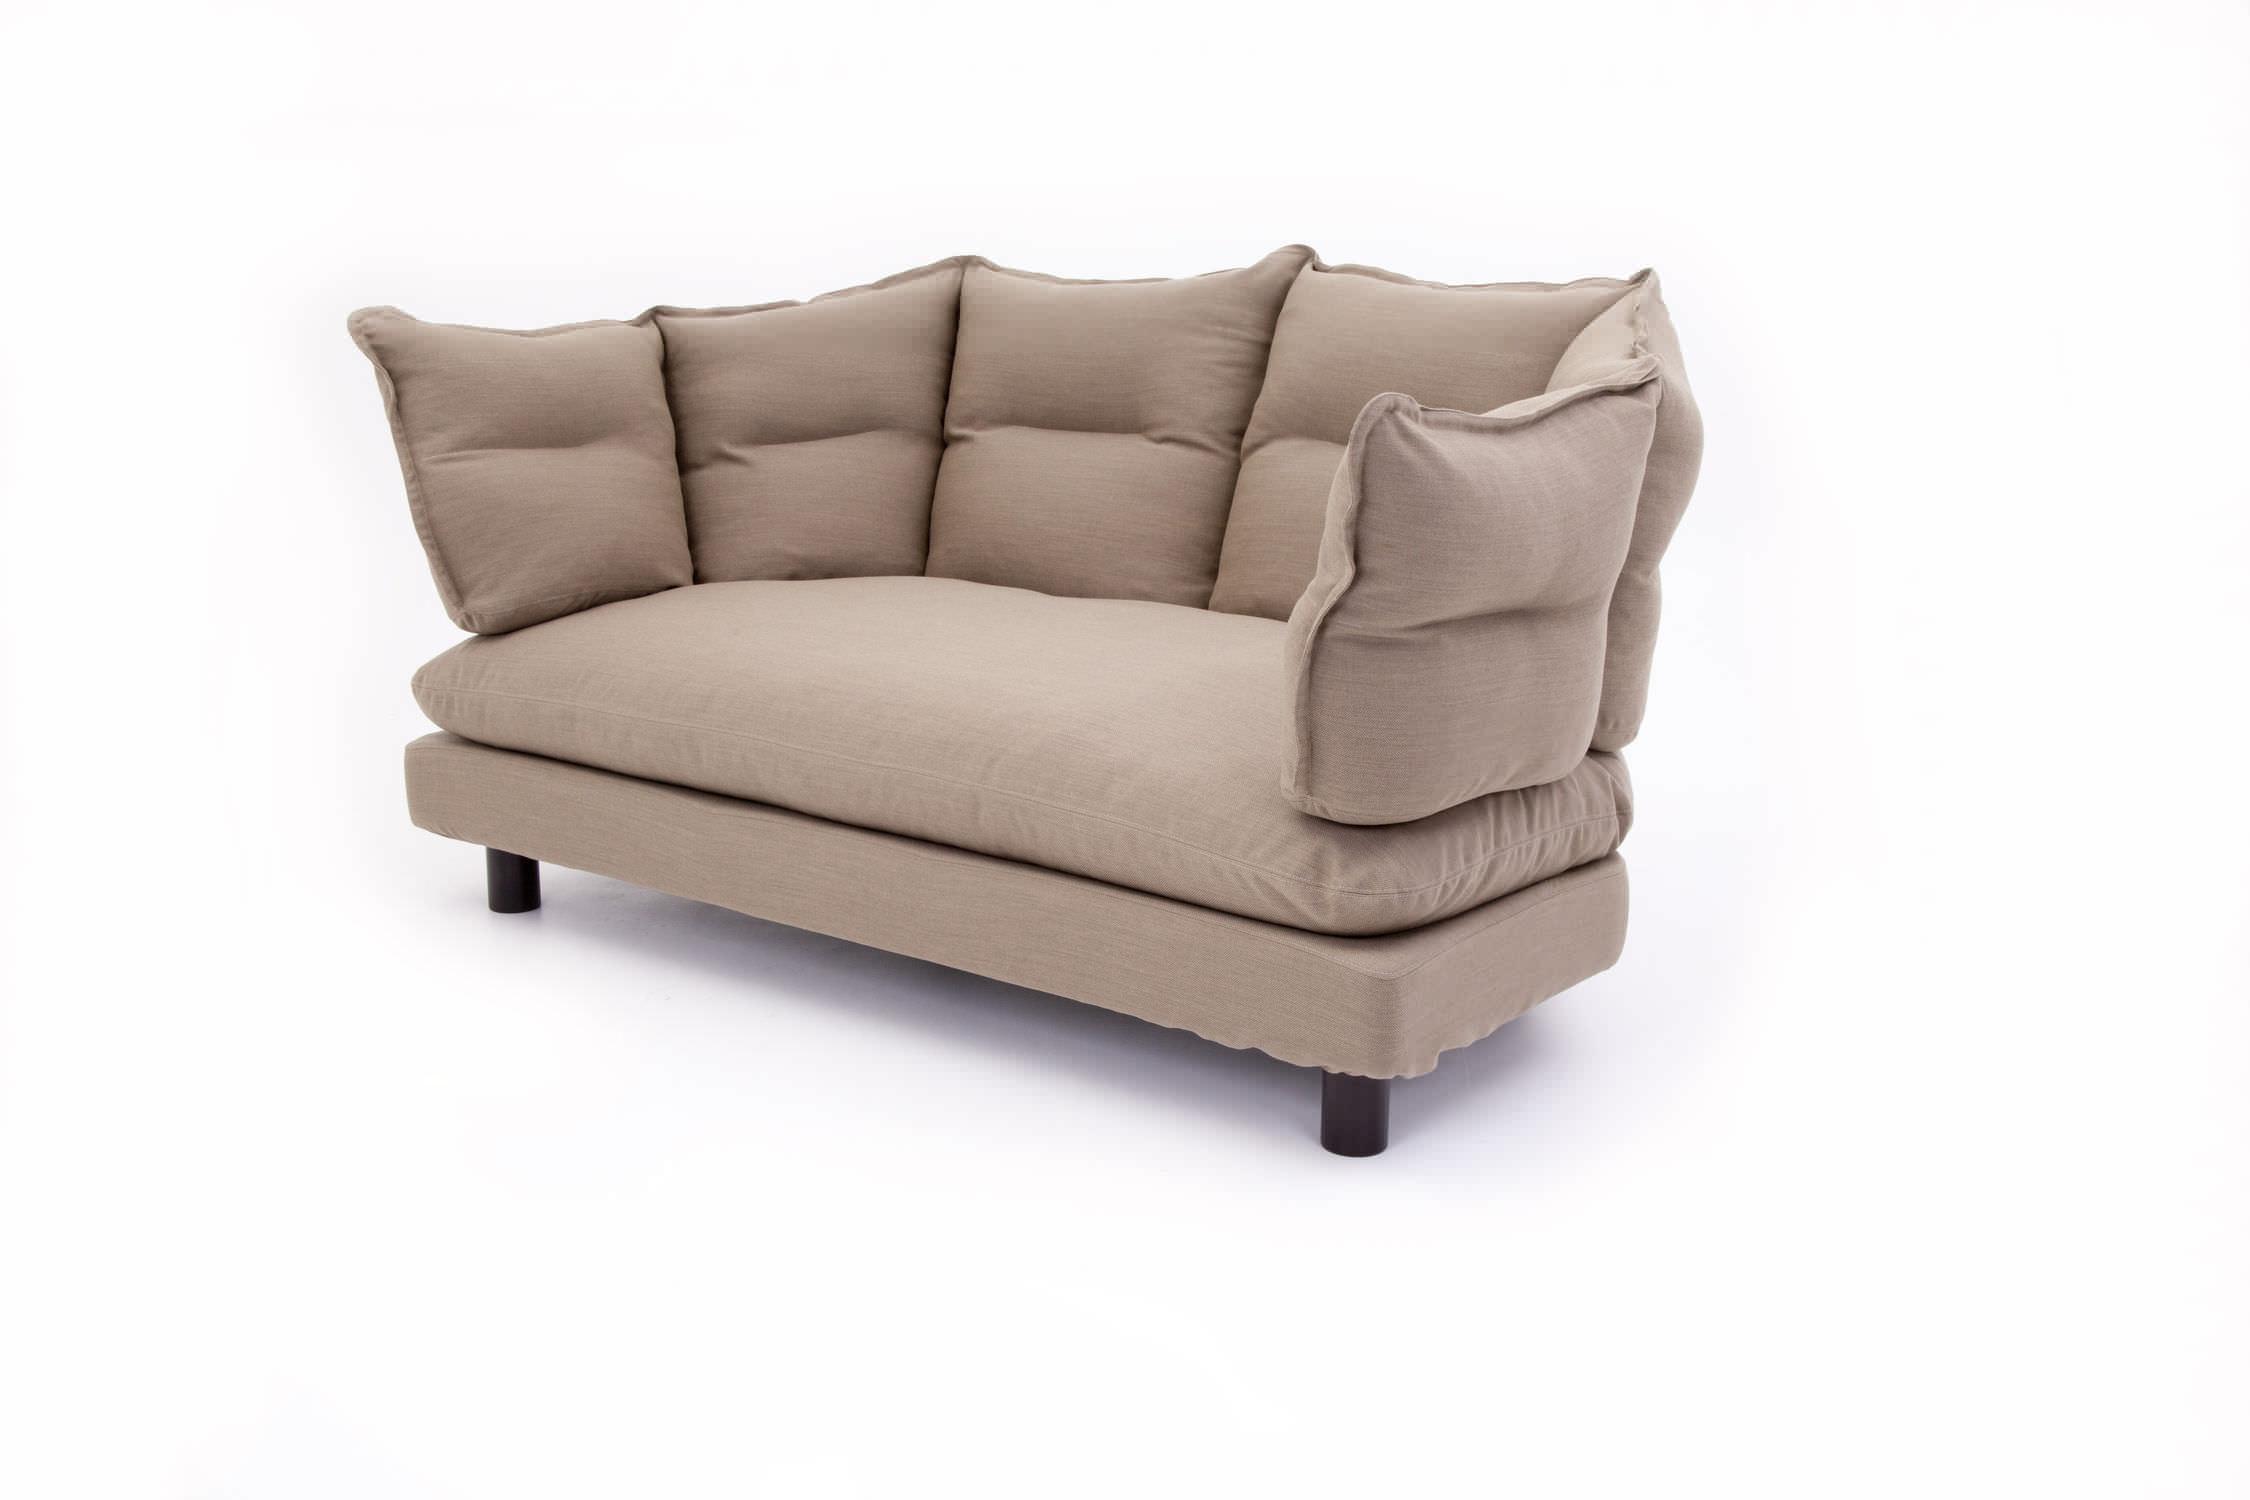 contemporary sofa / fabric / by inga sempe / 3-seater - enveloppe, Hause deko